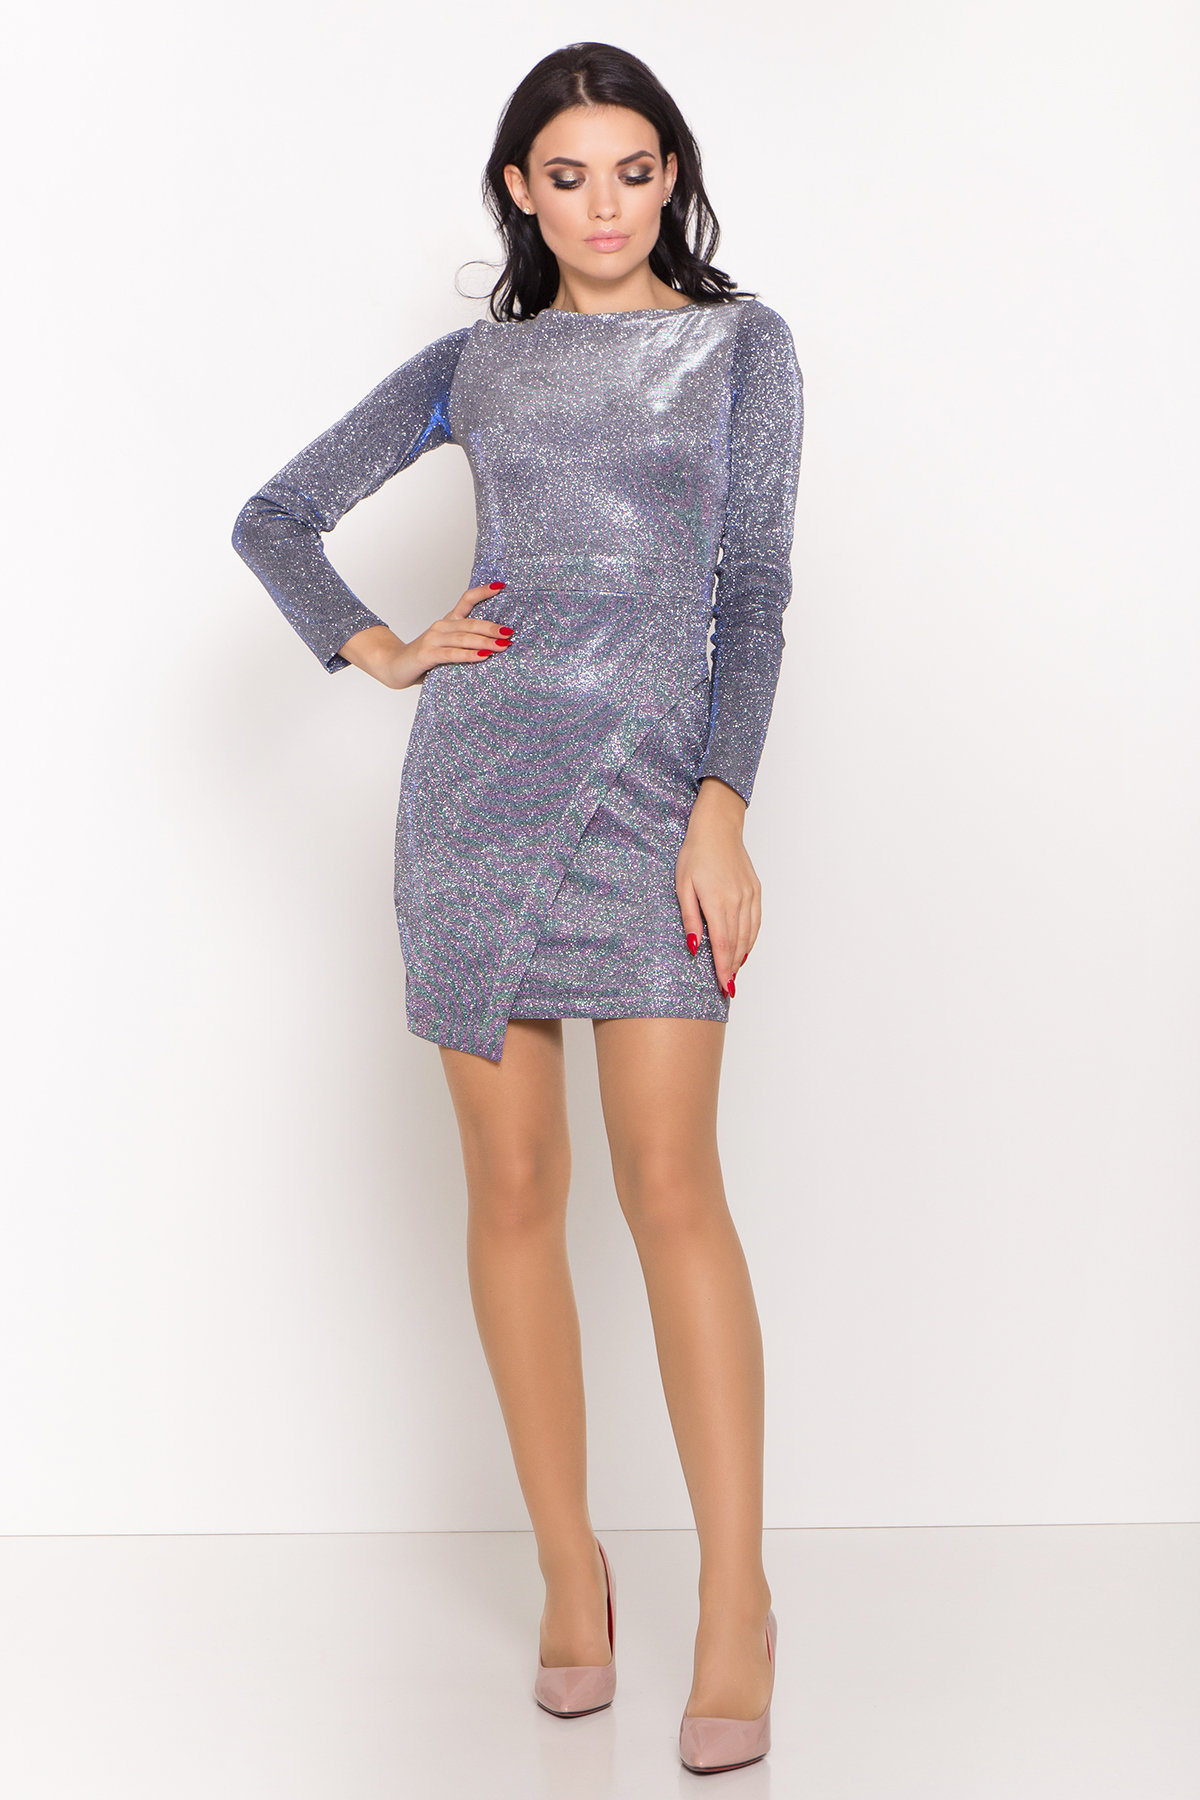 Коктейльное платье Кристал 8346 АРТ. 44717 Цвет: Серебро/электрик - фото 1, интернет магазин tm-modus.ru